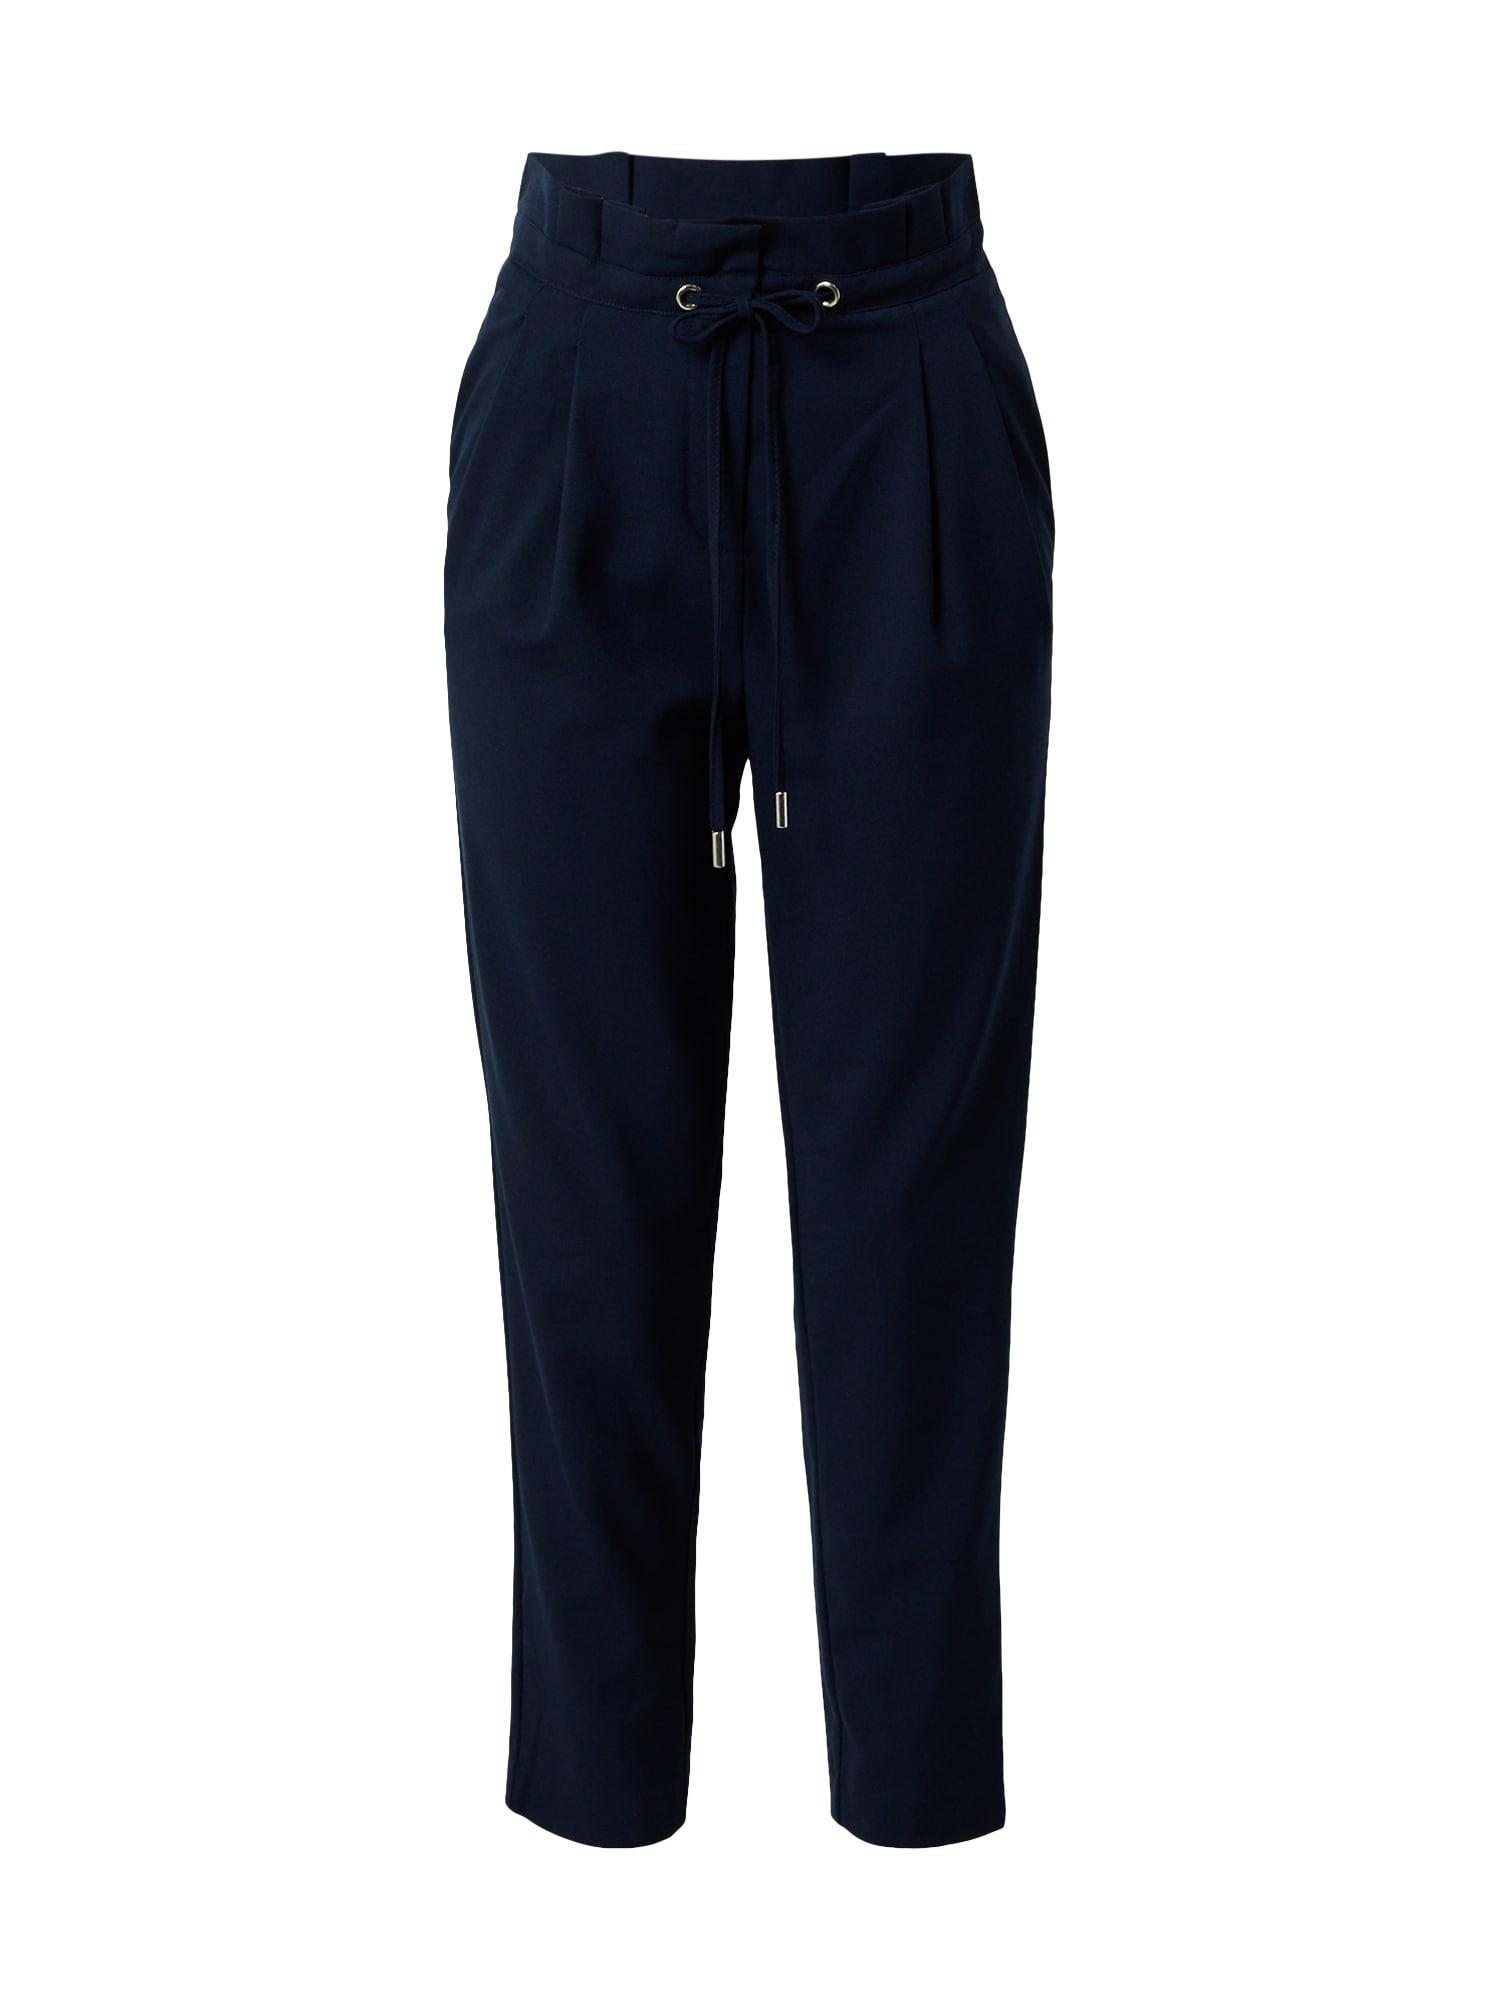 ONLY Kalhoty se sklady v pase 'Hero Life'  tmavě modrá